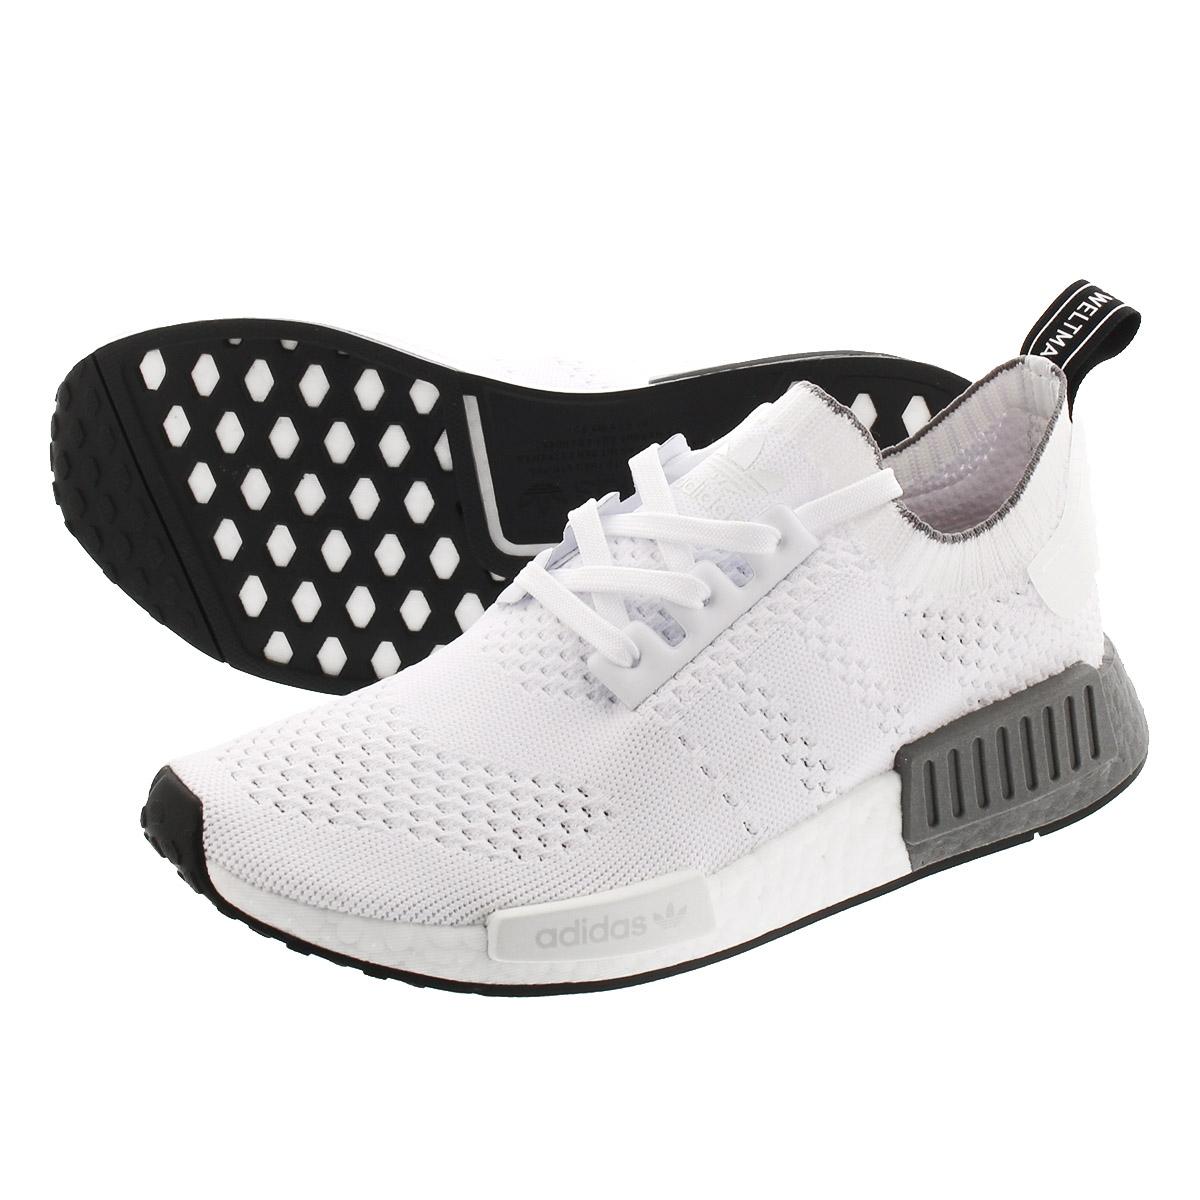 Nike NMD R1 Grey Camo Heel Sneakers Shoes